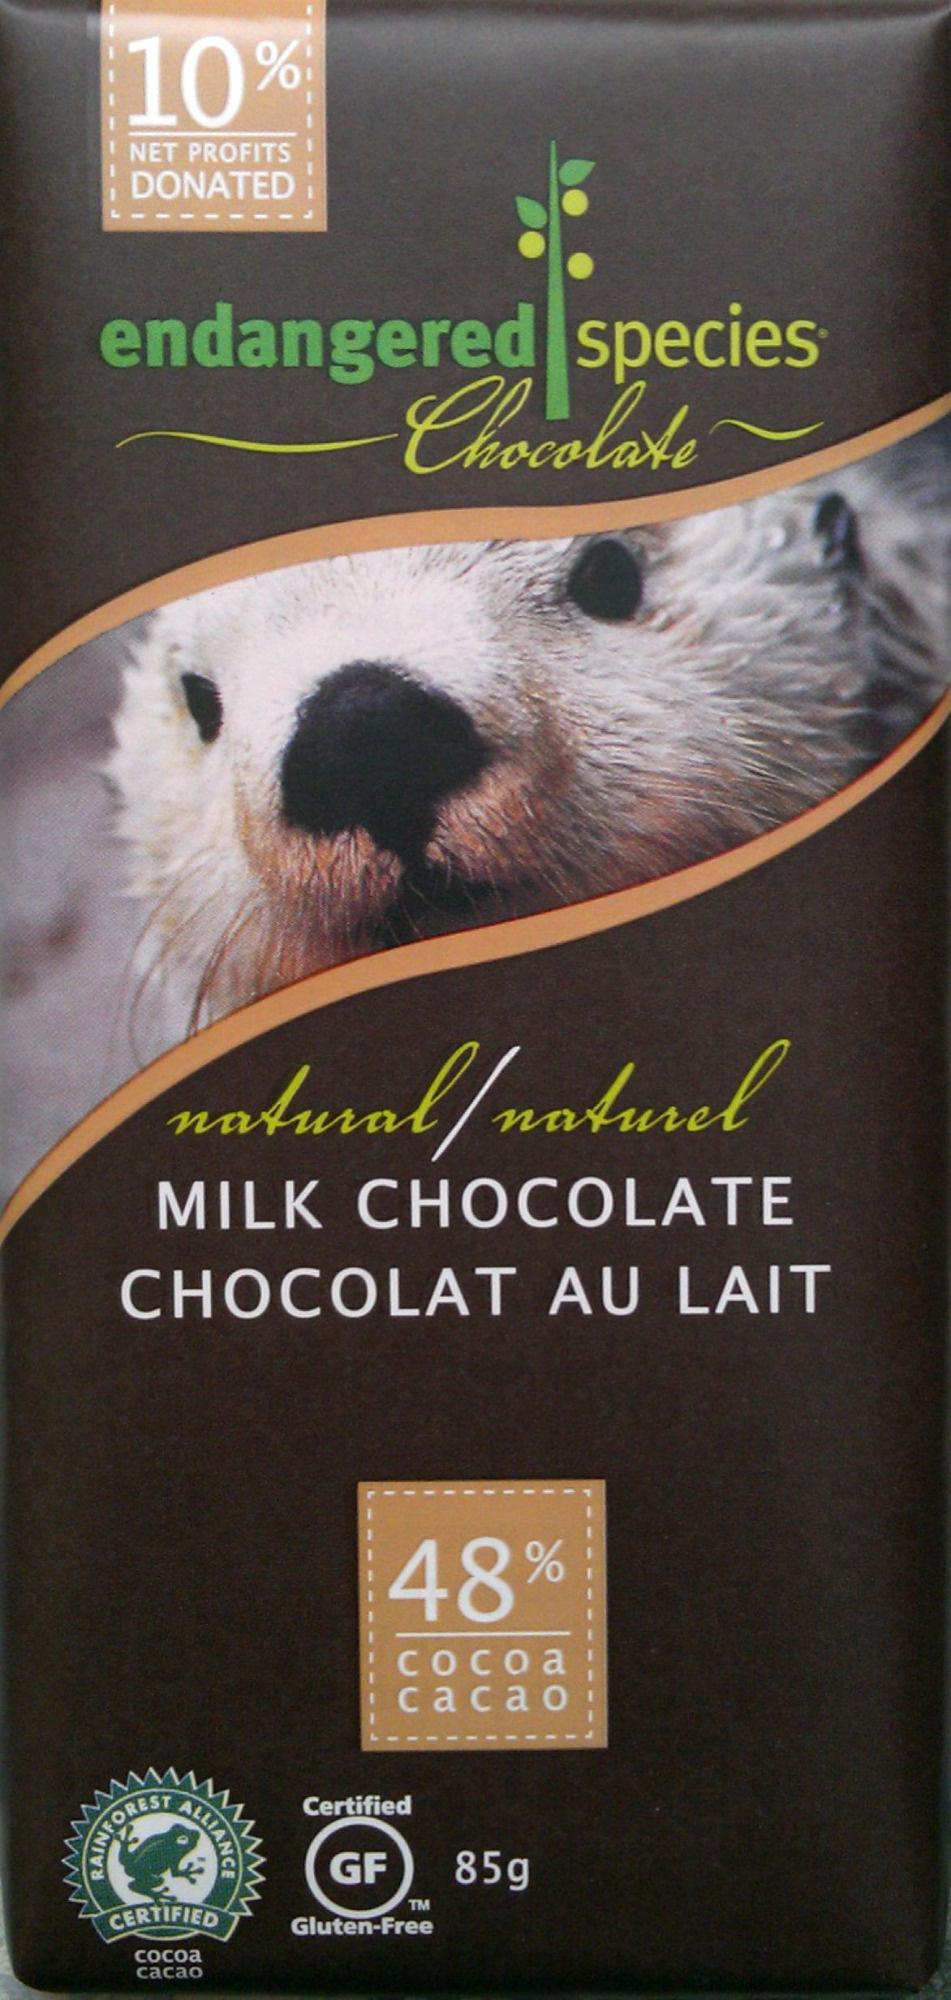 Natural Milk Chocolate - endangered species chocolate - 85 g